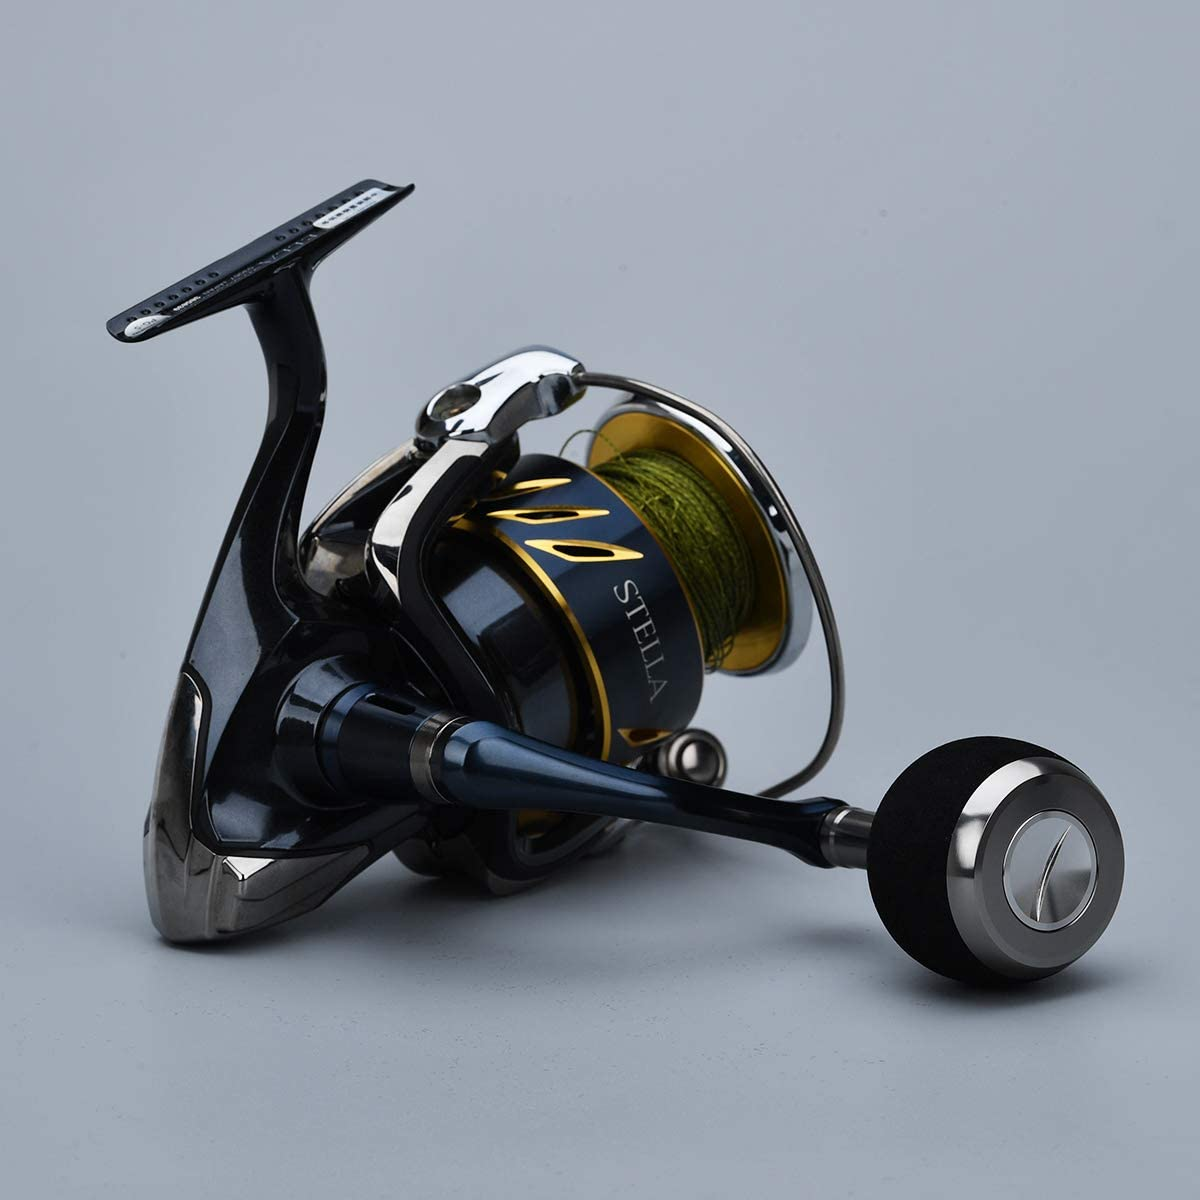 Gomexus Poign/ée Moulinet EVA pour Shimano Twinpower XD 1000-5000 Stradic 1000-4000 Daiwa Exceler Certate LT 1000-4000 Bouton Spinning Moulinet Direct,Daiwa BG Ninja Penn Spinfisher Perceuse